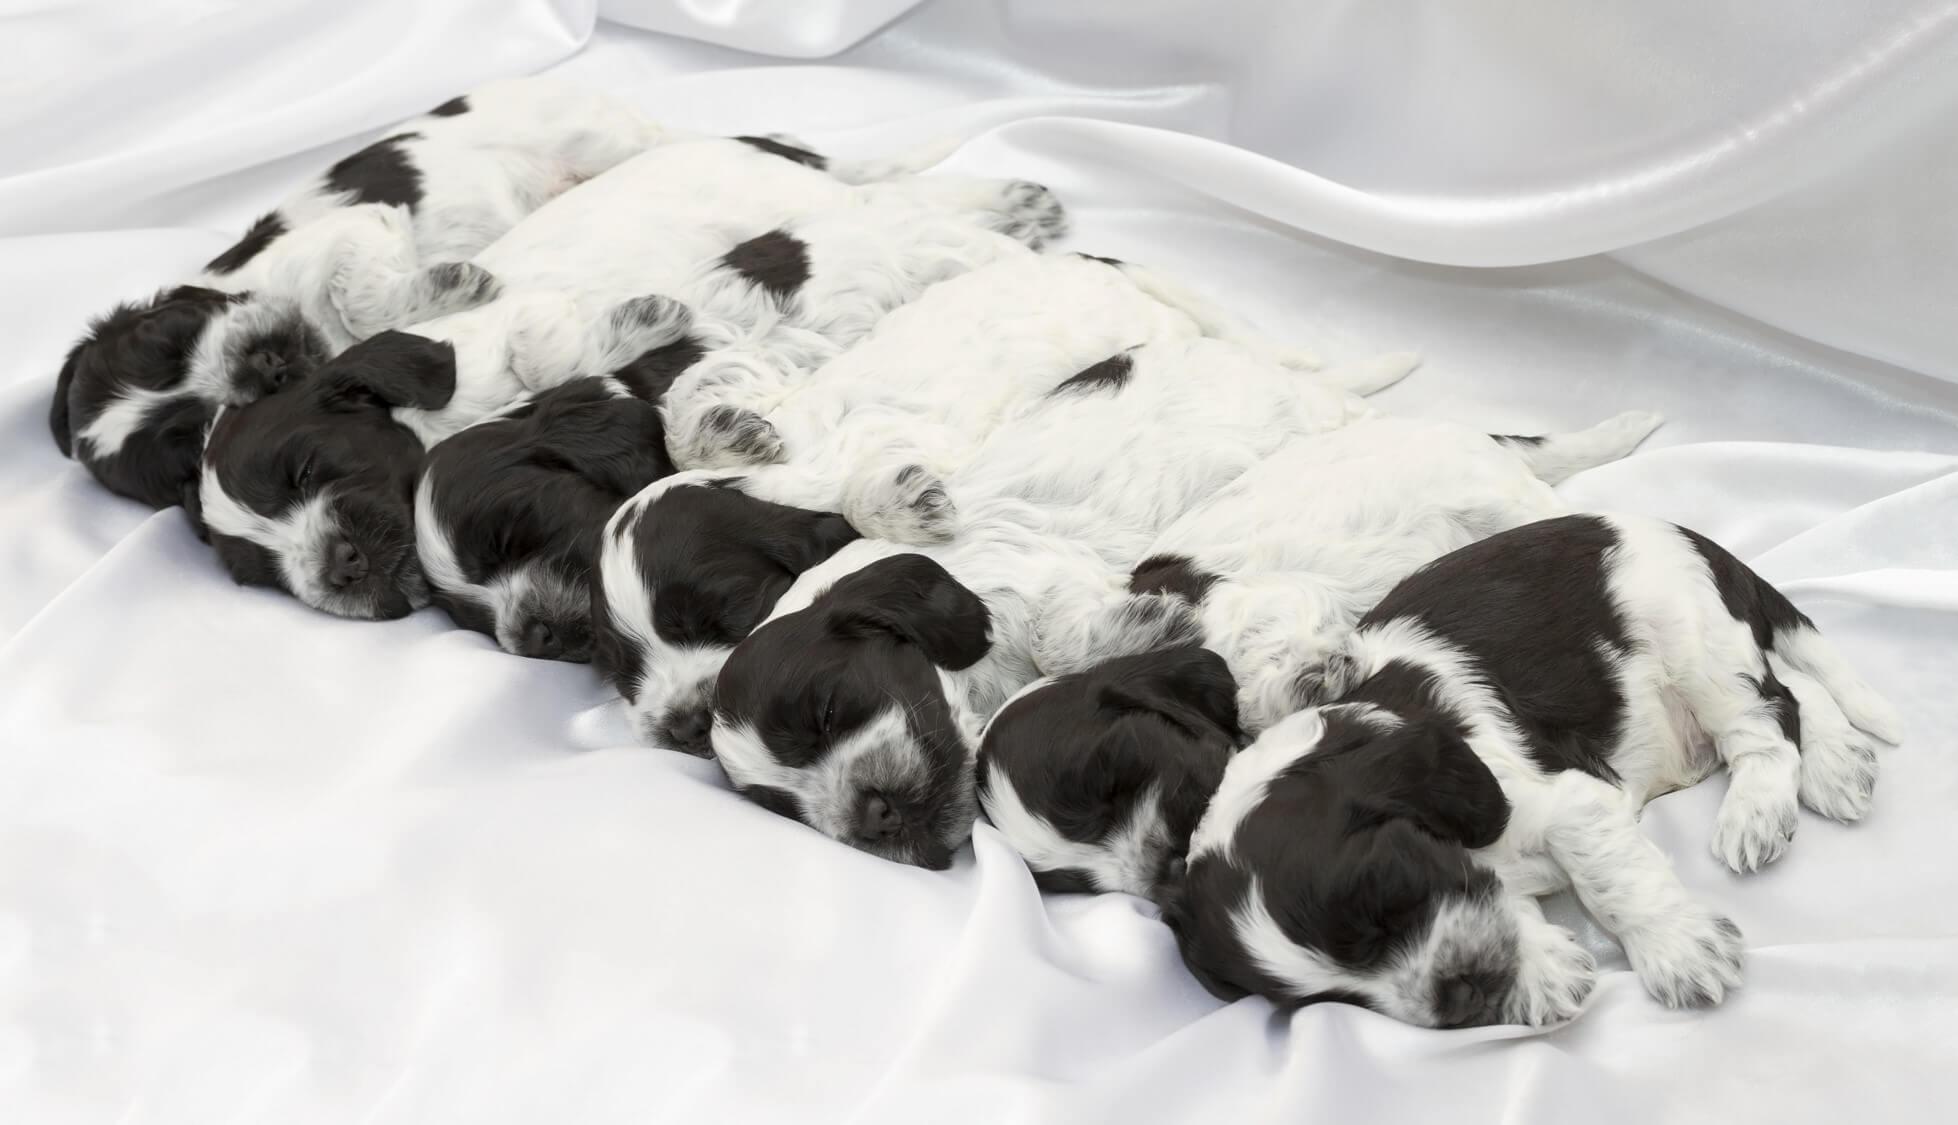 Litter of puppies sleeping